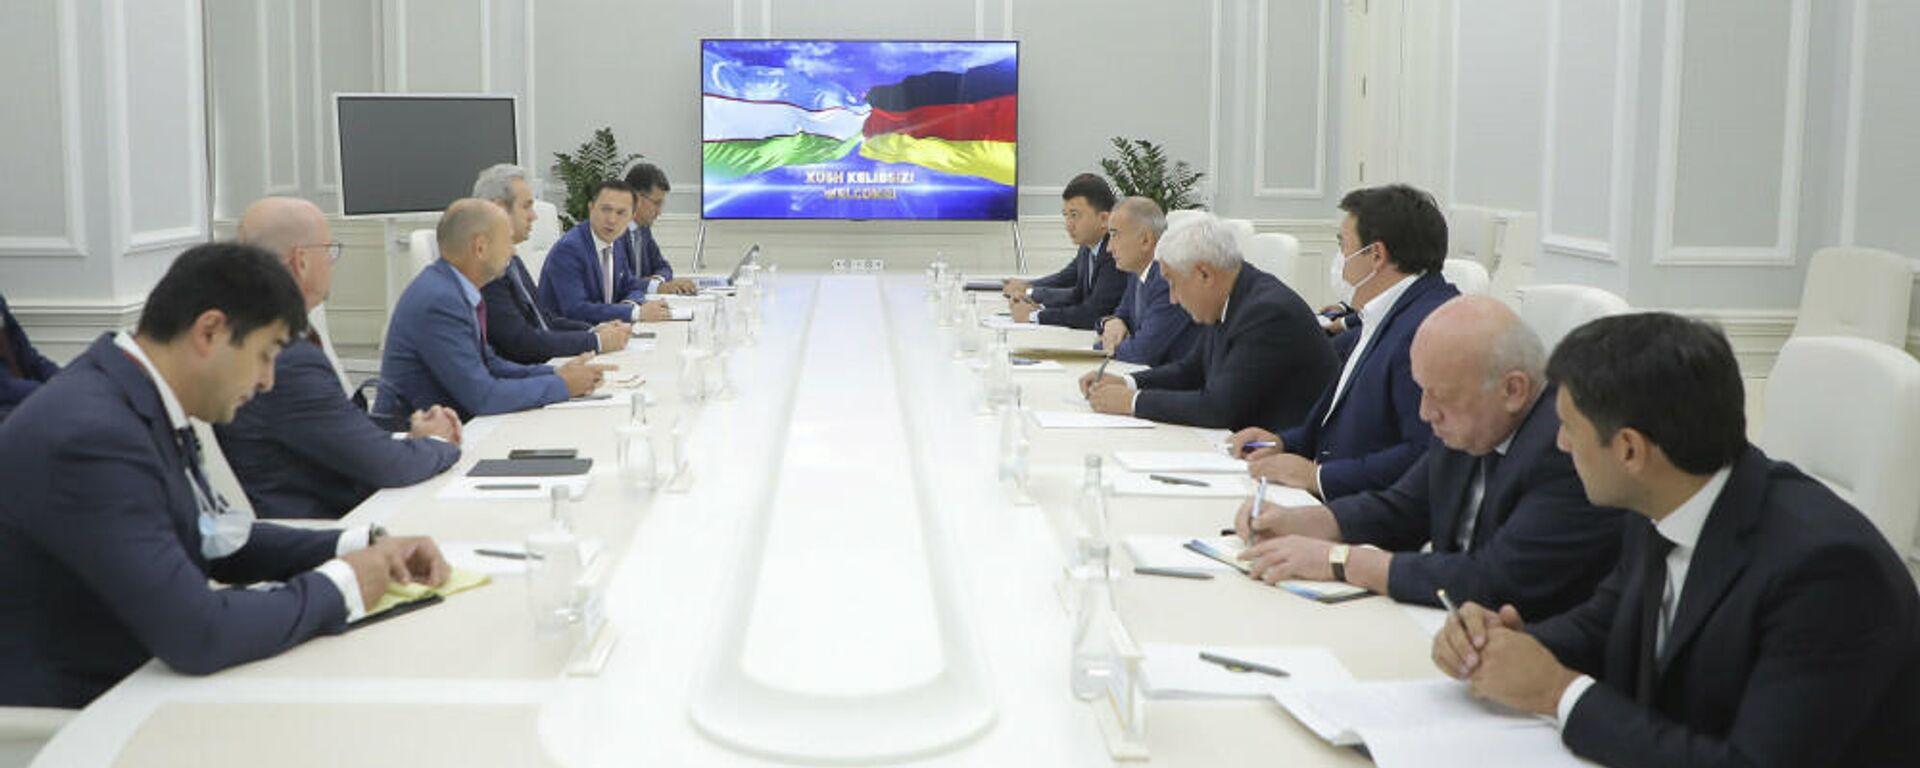 Встреча хокима Ташкента с представителями немецкой компании Siemens - Sputnik Узбекистан, 1920, 02.10.2021